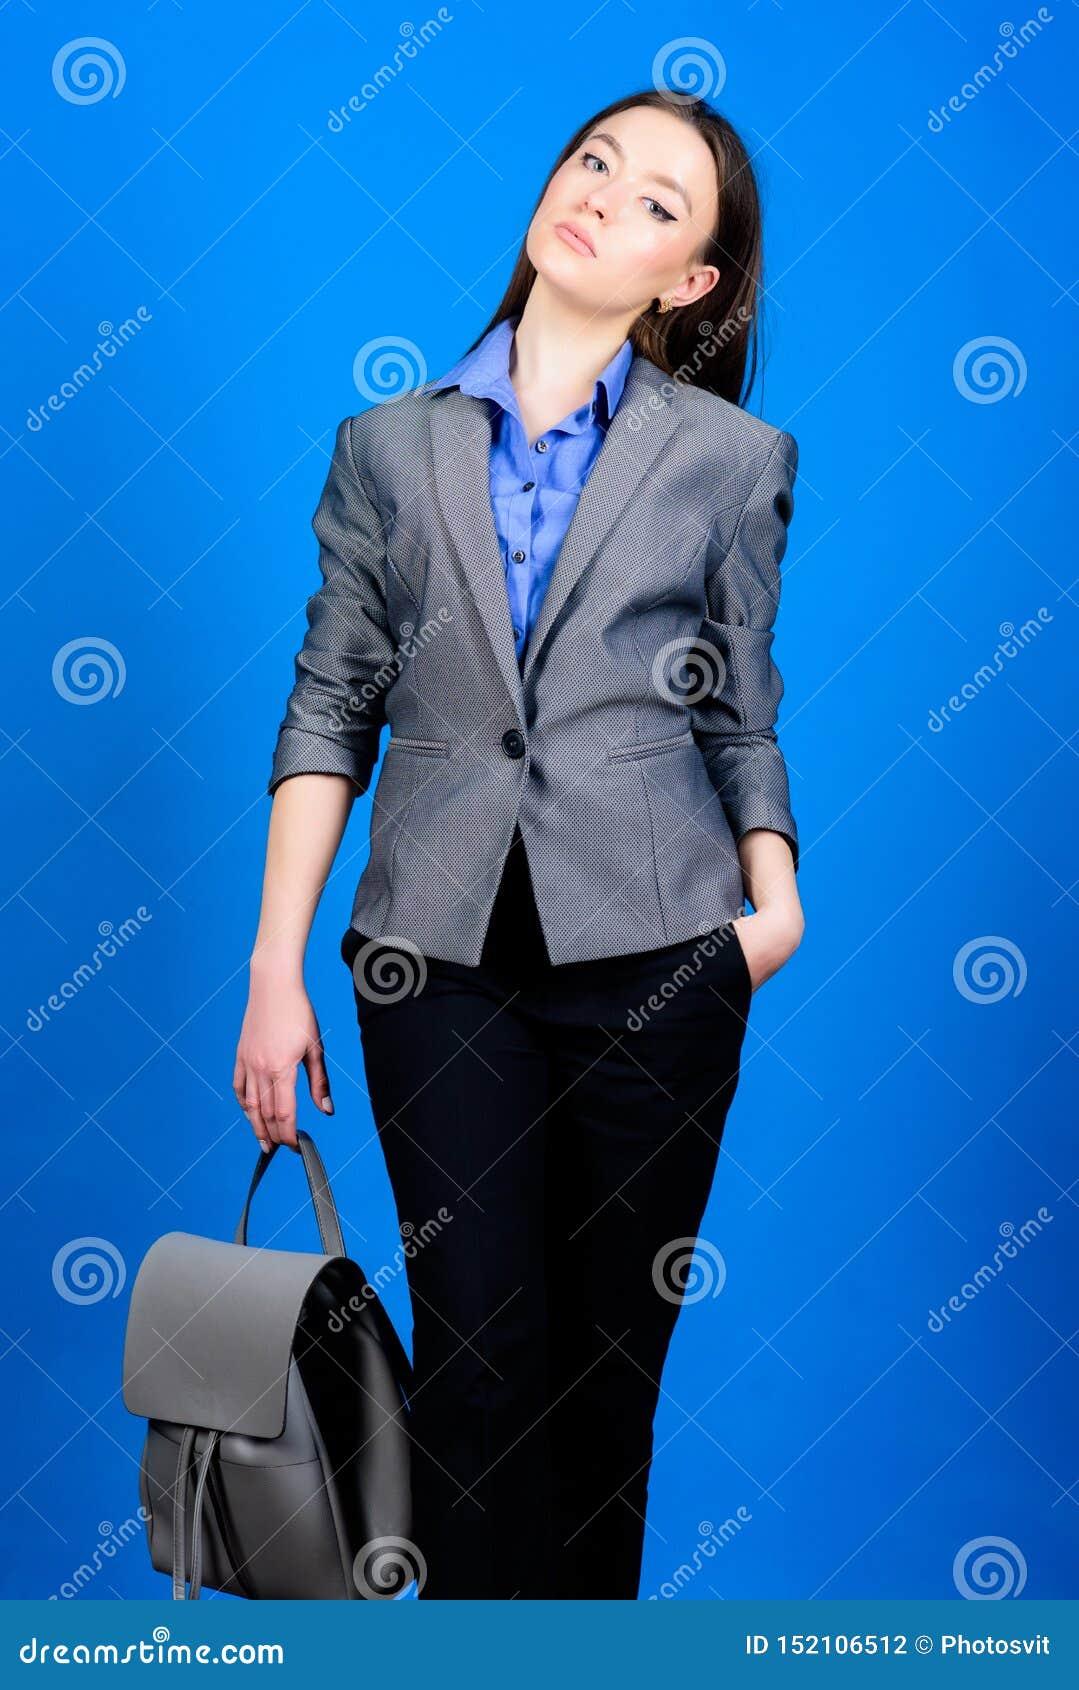 E estudante na roupa formal :